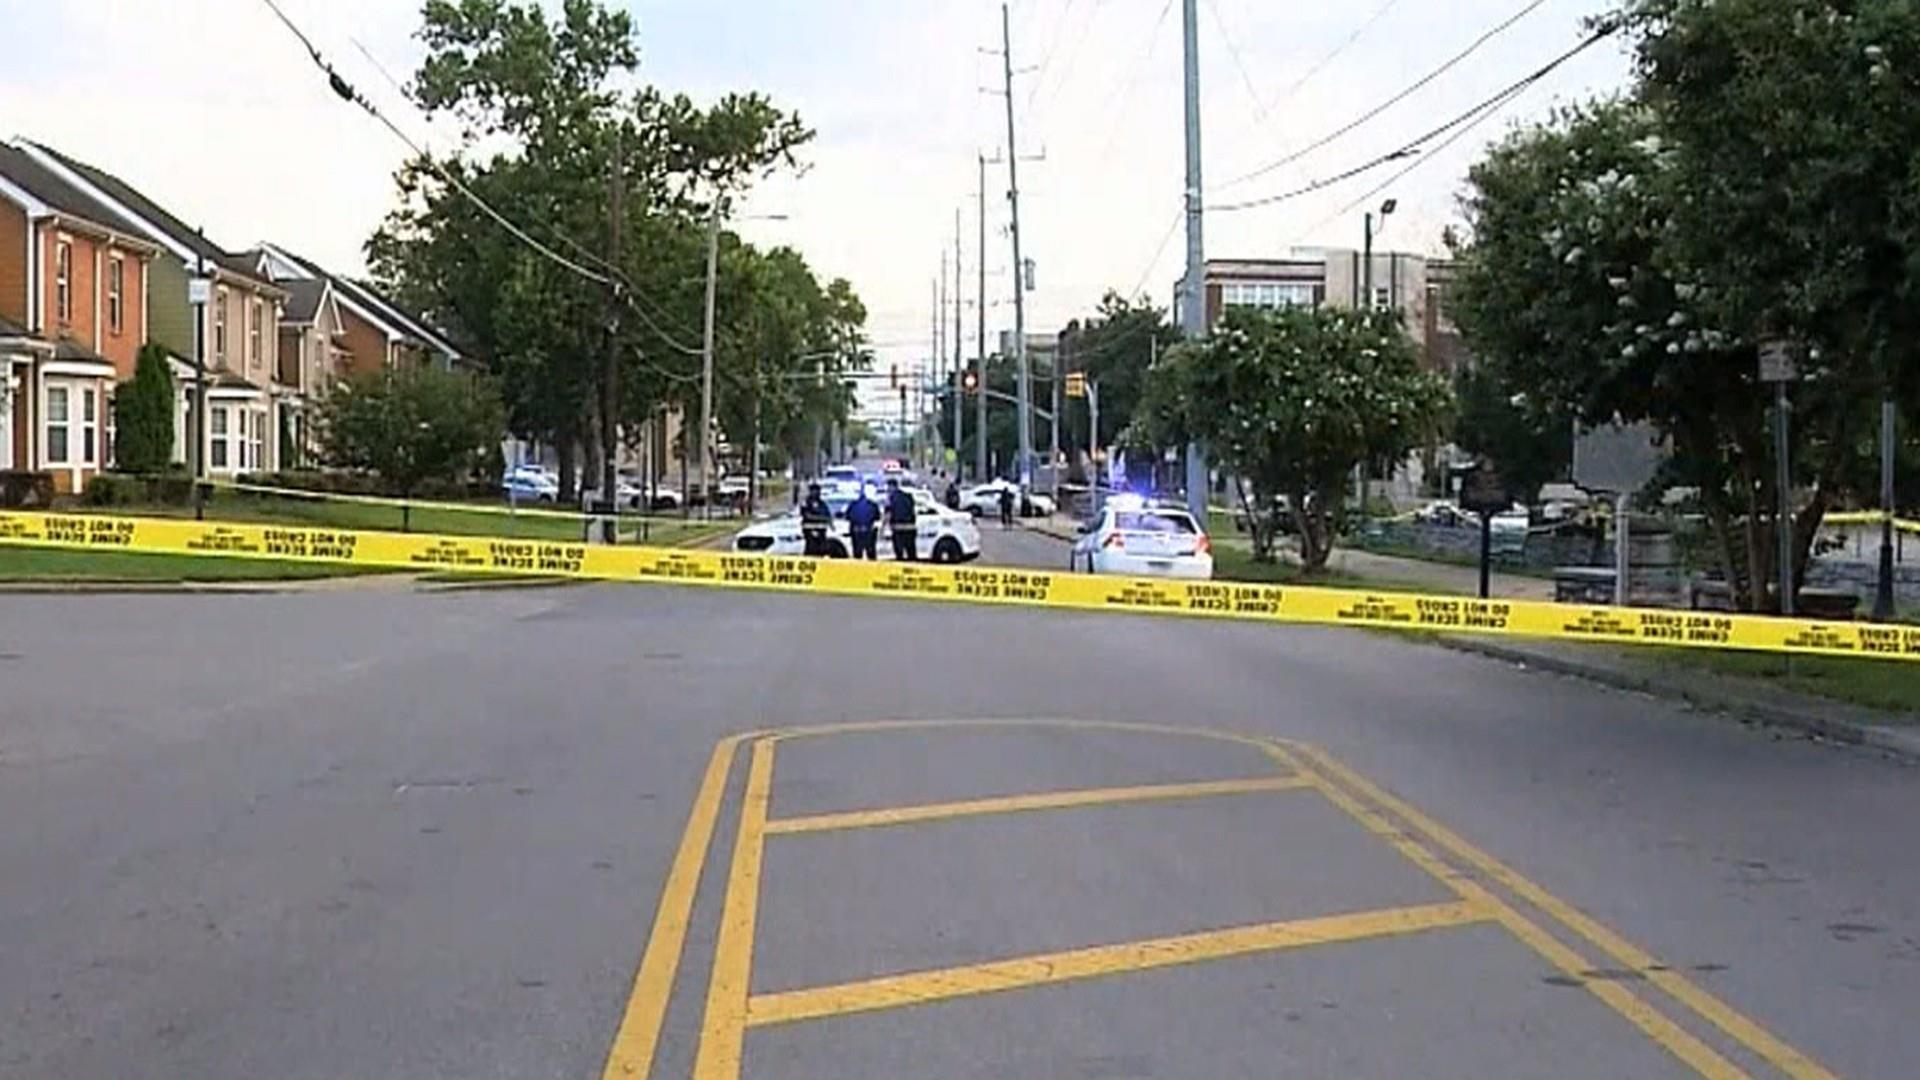 Nashville police officer charged with criminal homicide after shooting black man in the back